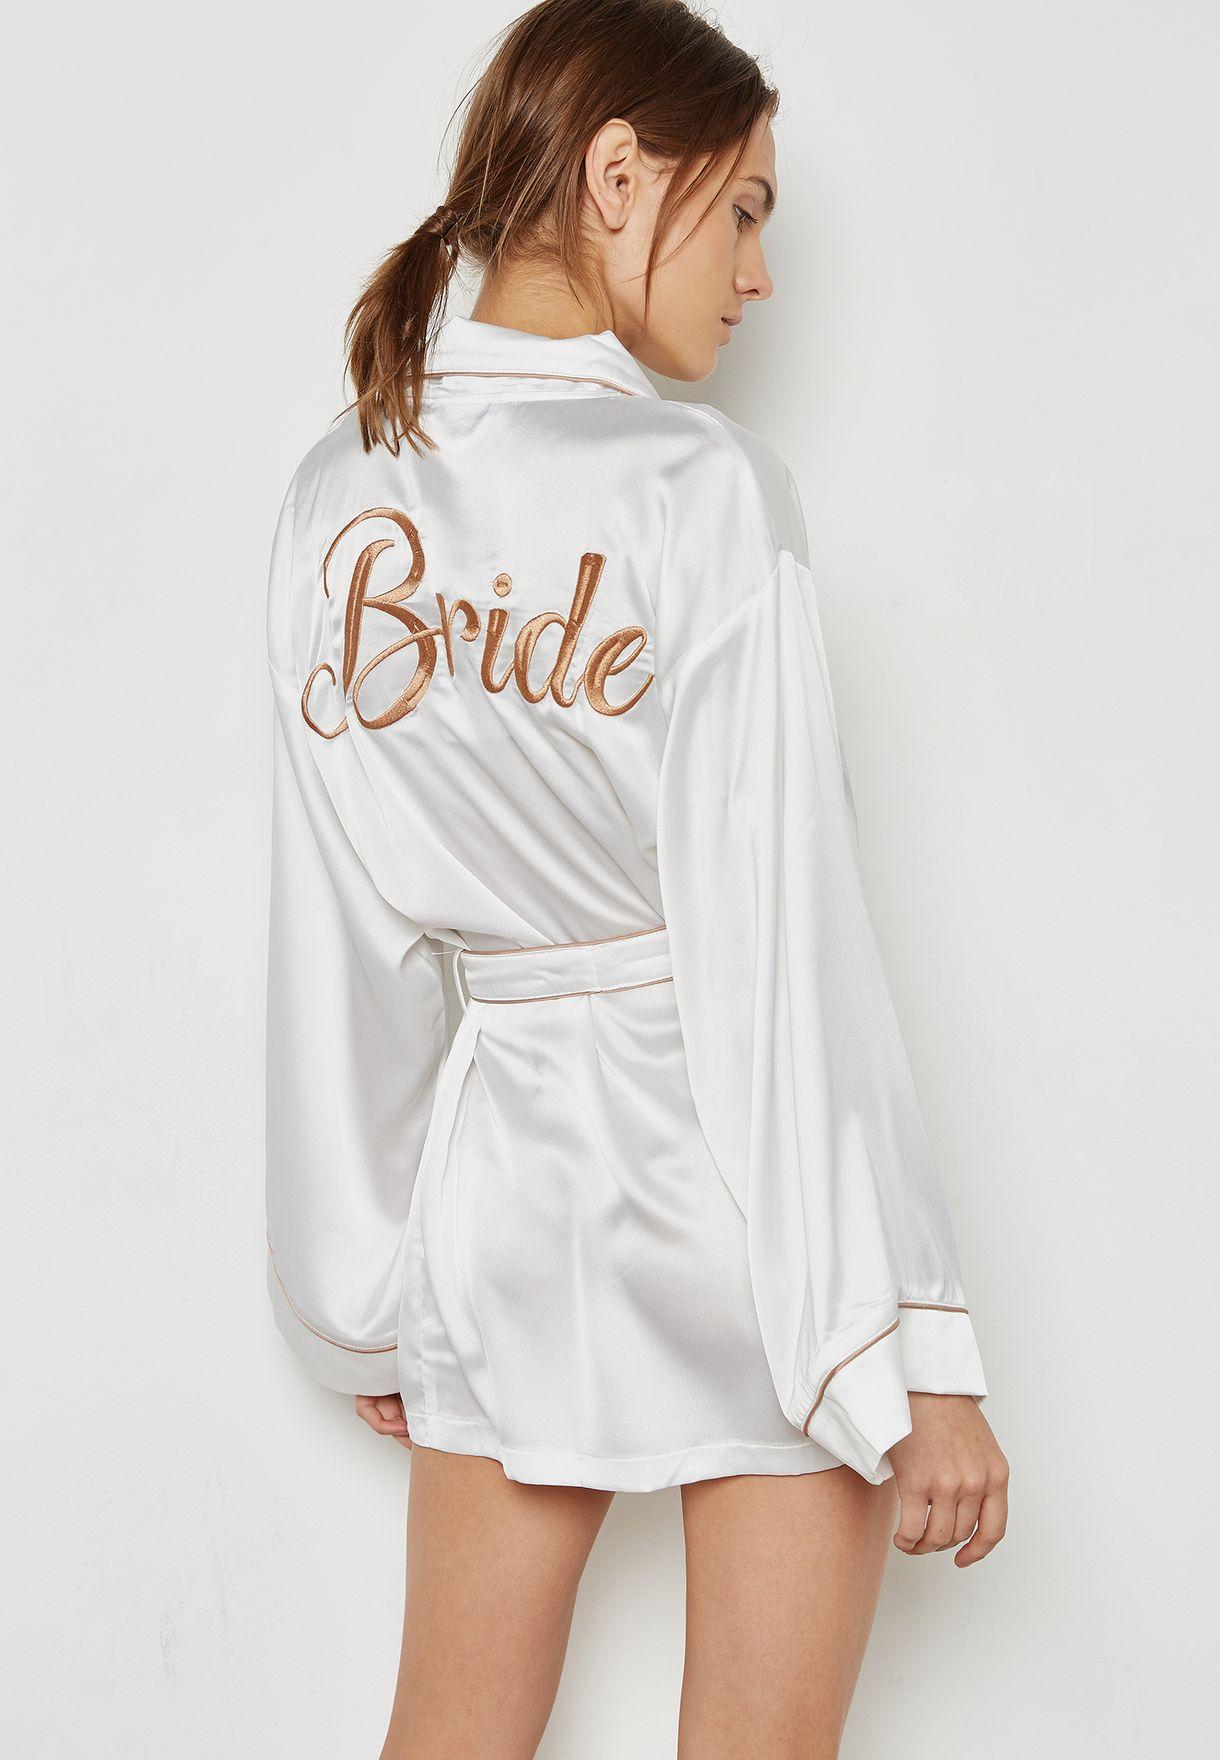 5b502f2f93b13 تسوق روب العروس ماركة ميس جايديد لون أبيض N9332555 في الامارات ...